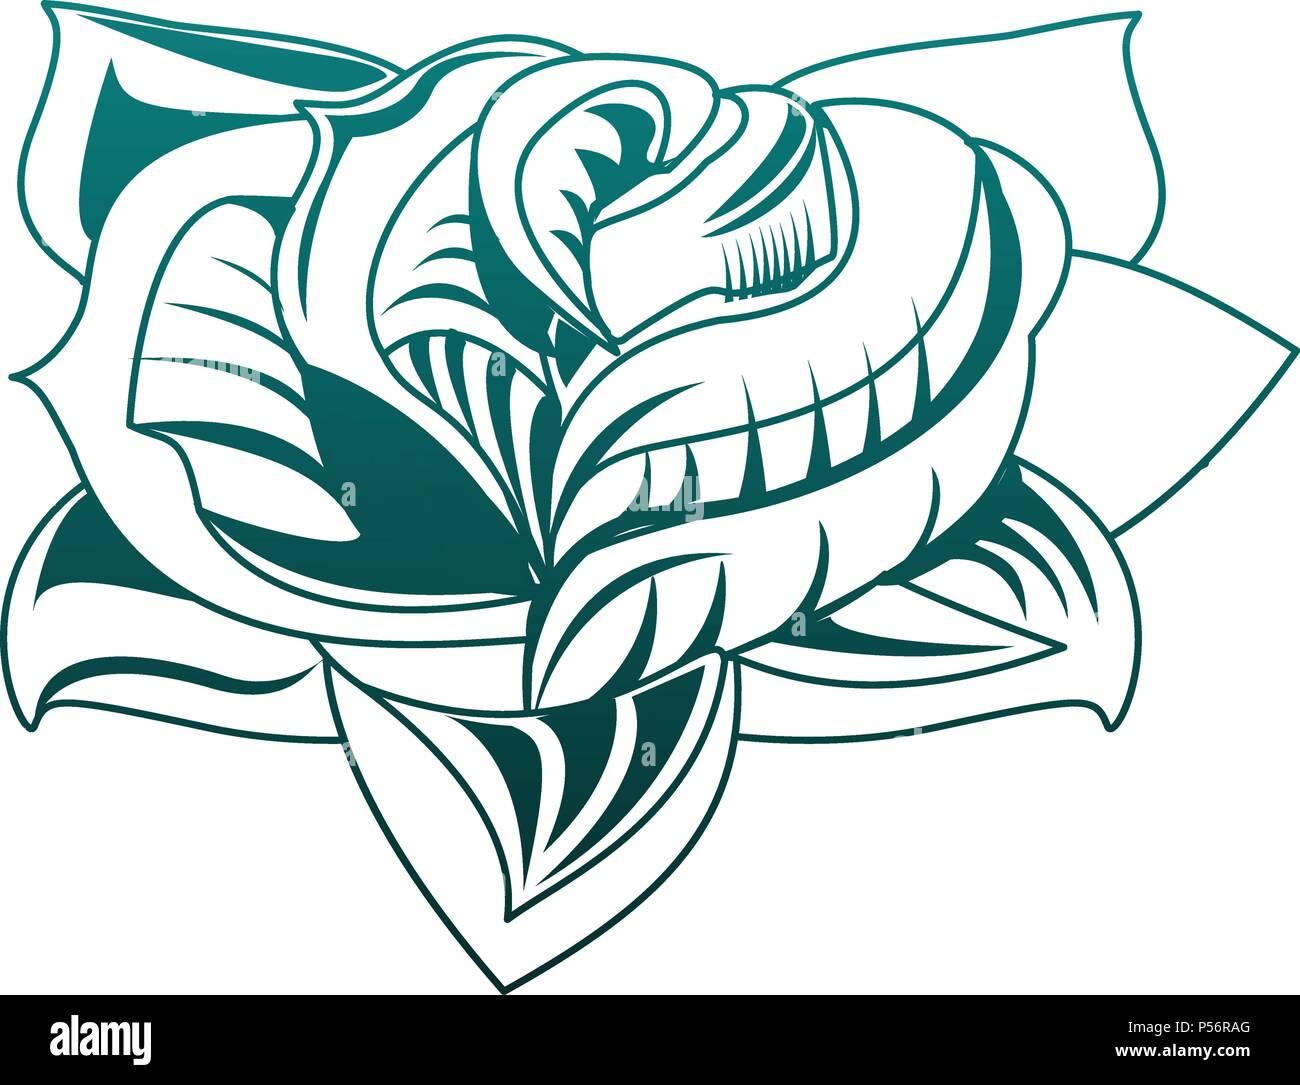 Dibujo De Tatuaje De Flores En Lineas Azules Ilustracion Del Vector